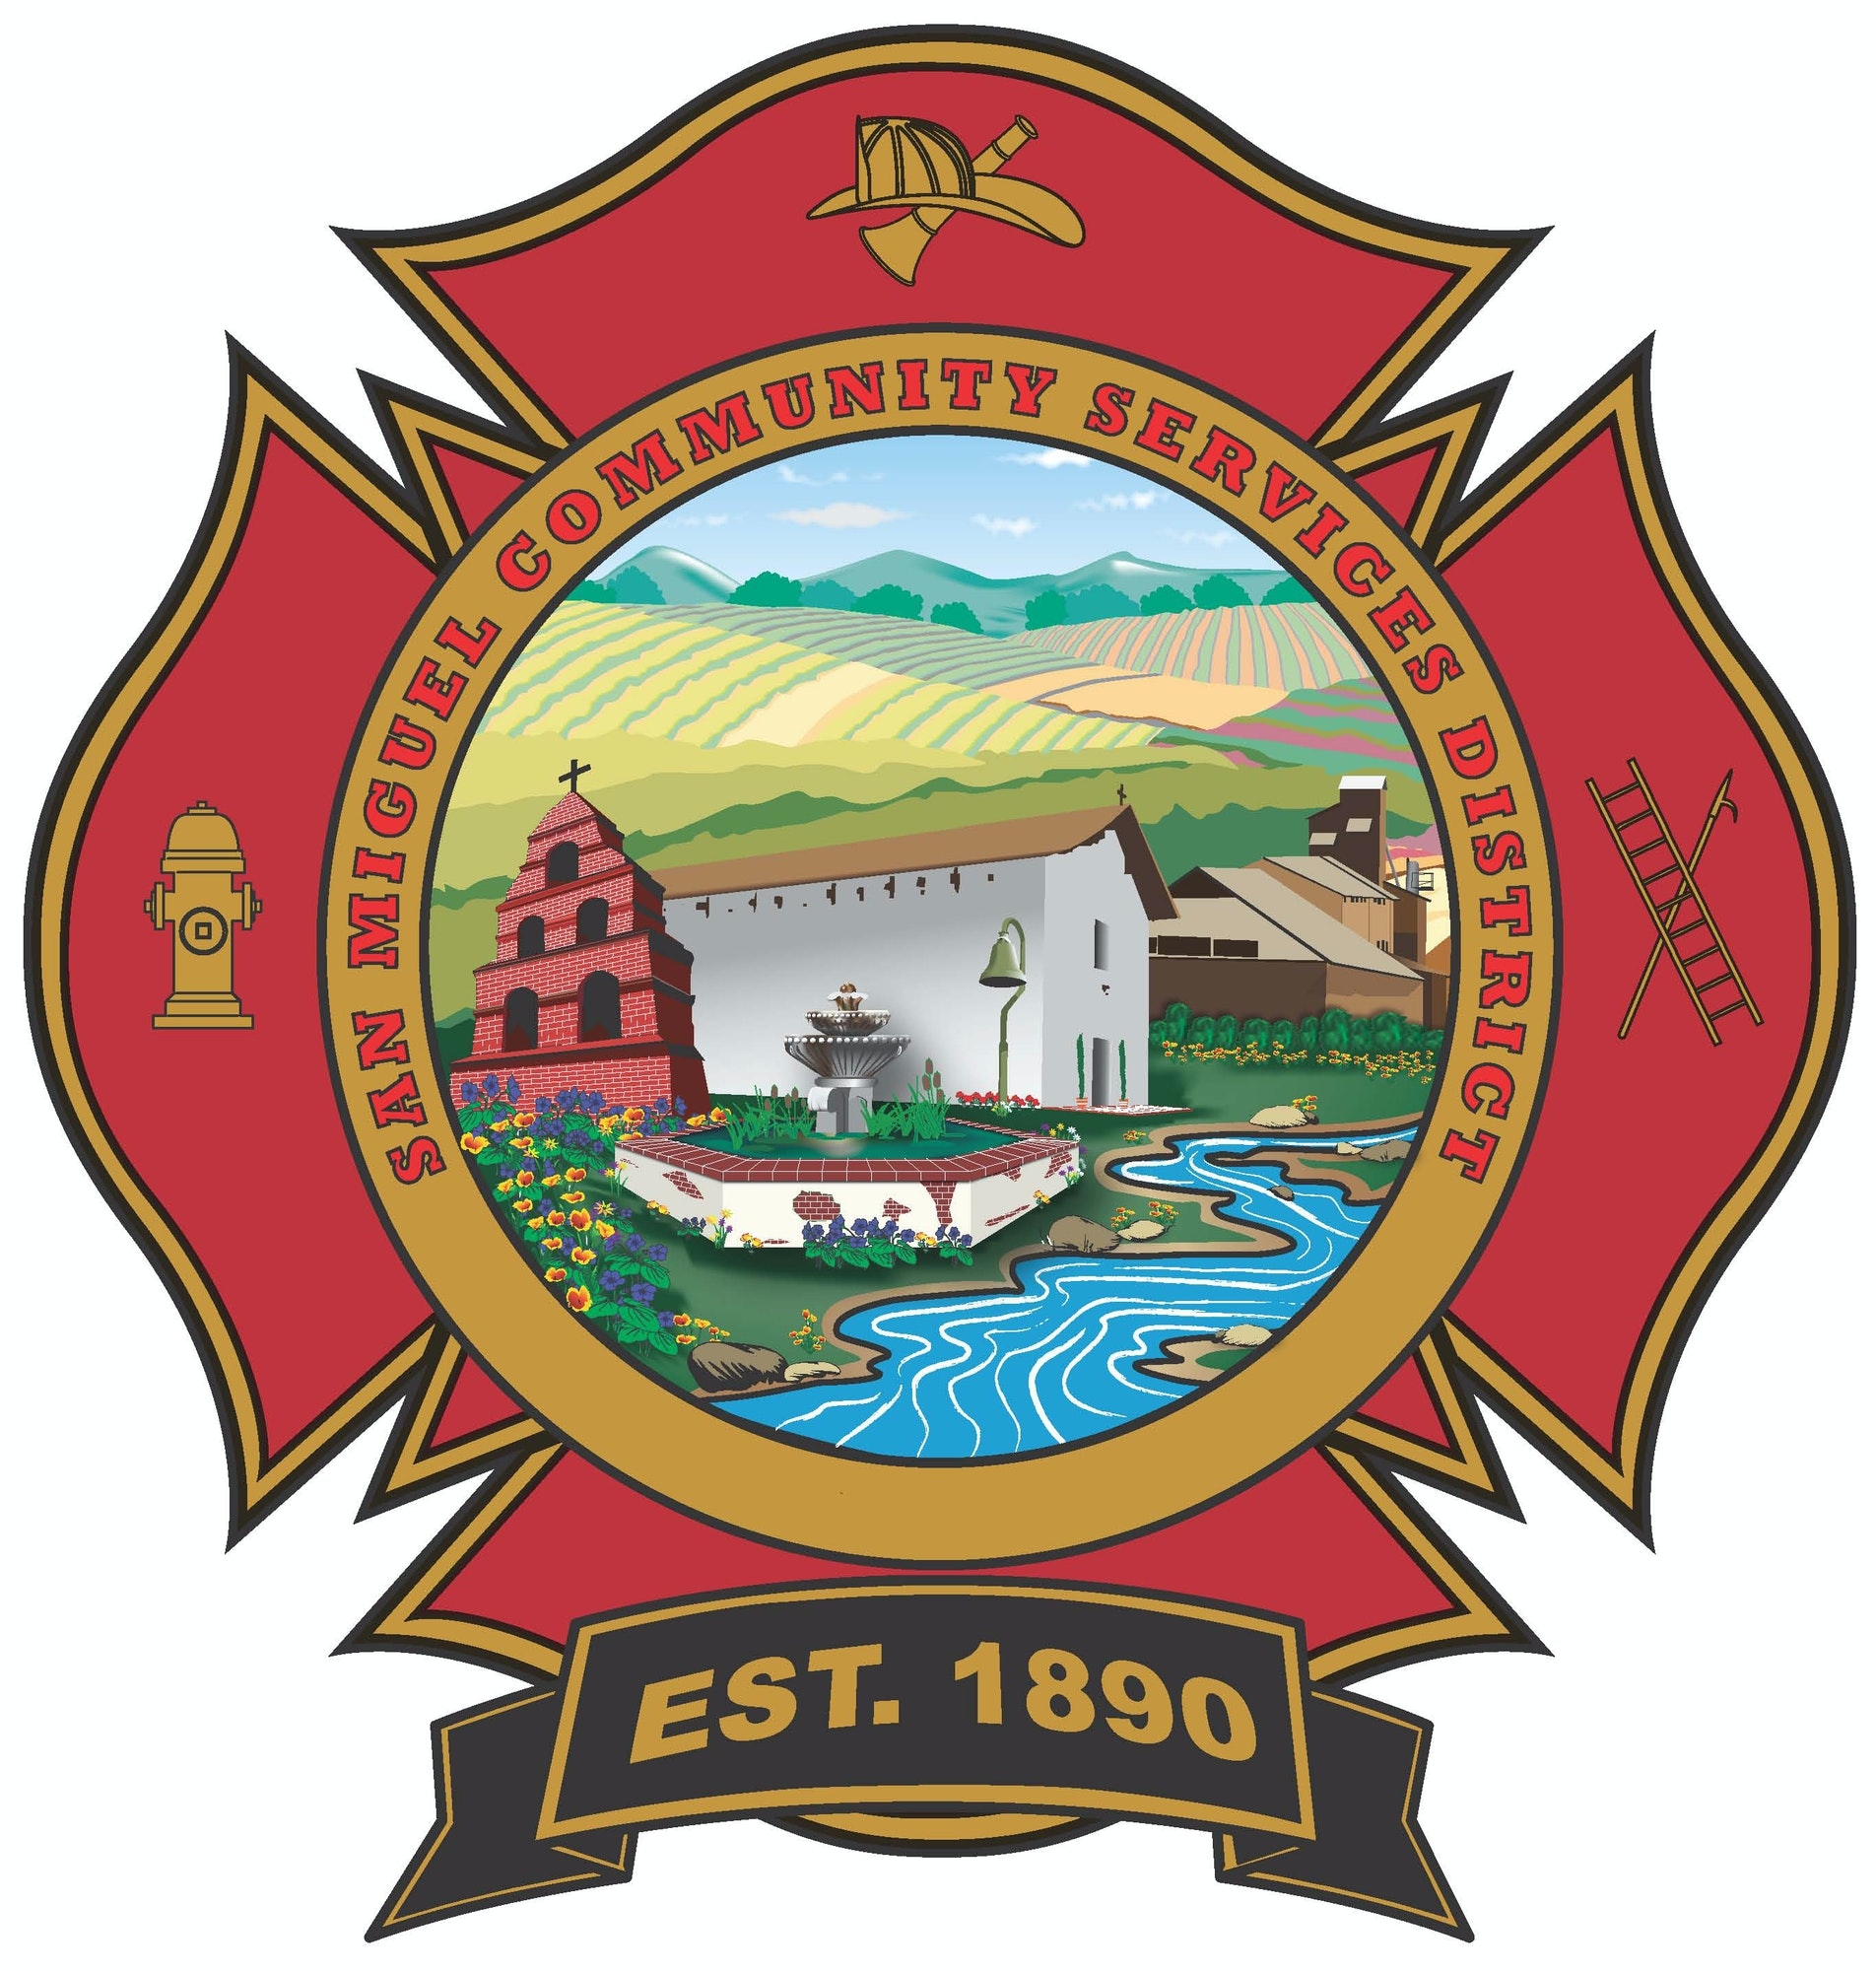 Fire department san miguel csd fire department buycottarizona Choice Image